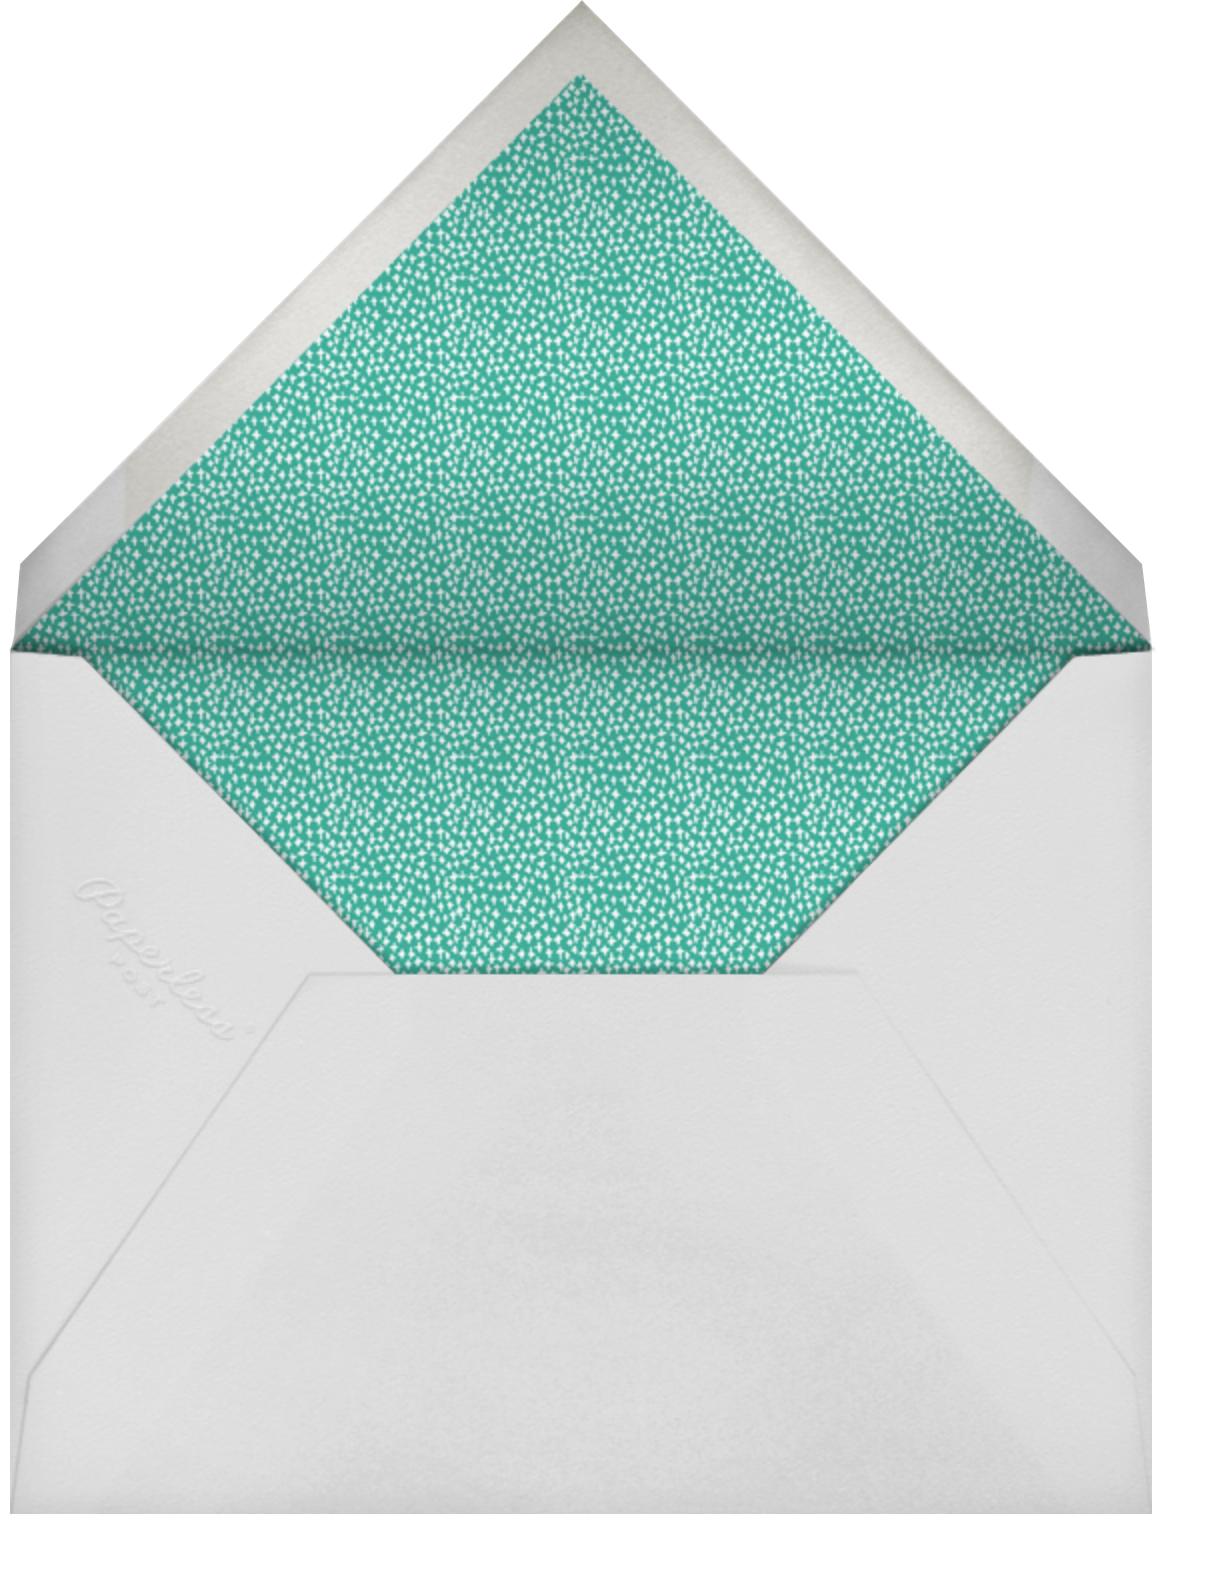 Pine and Dandy - White - Mr. Boddington's Studio - General entertaining - envelope back